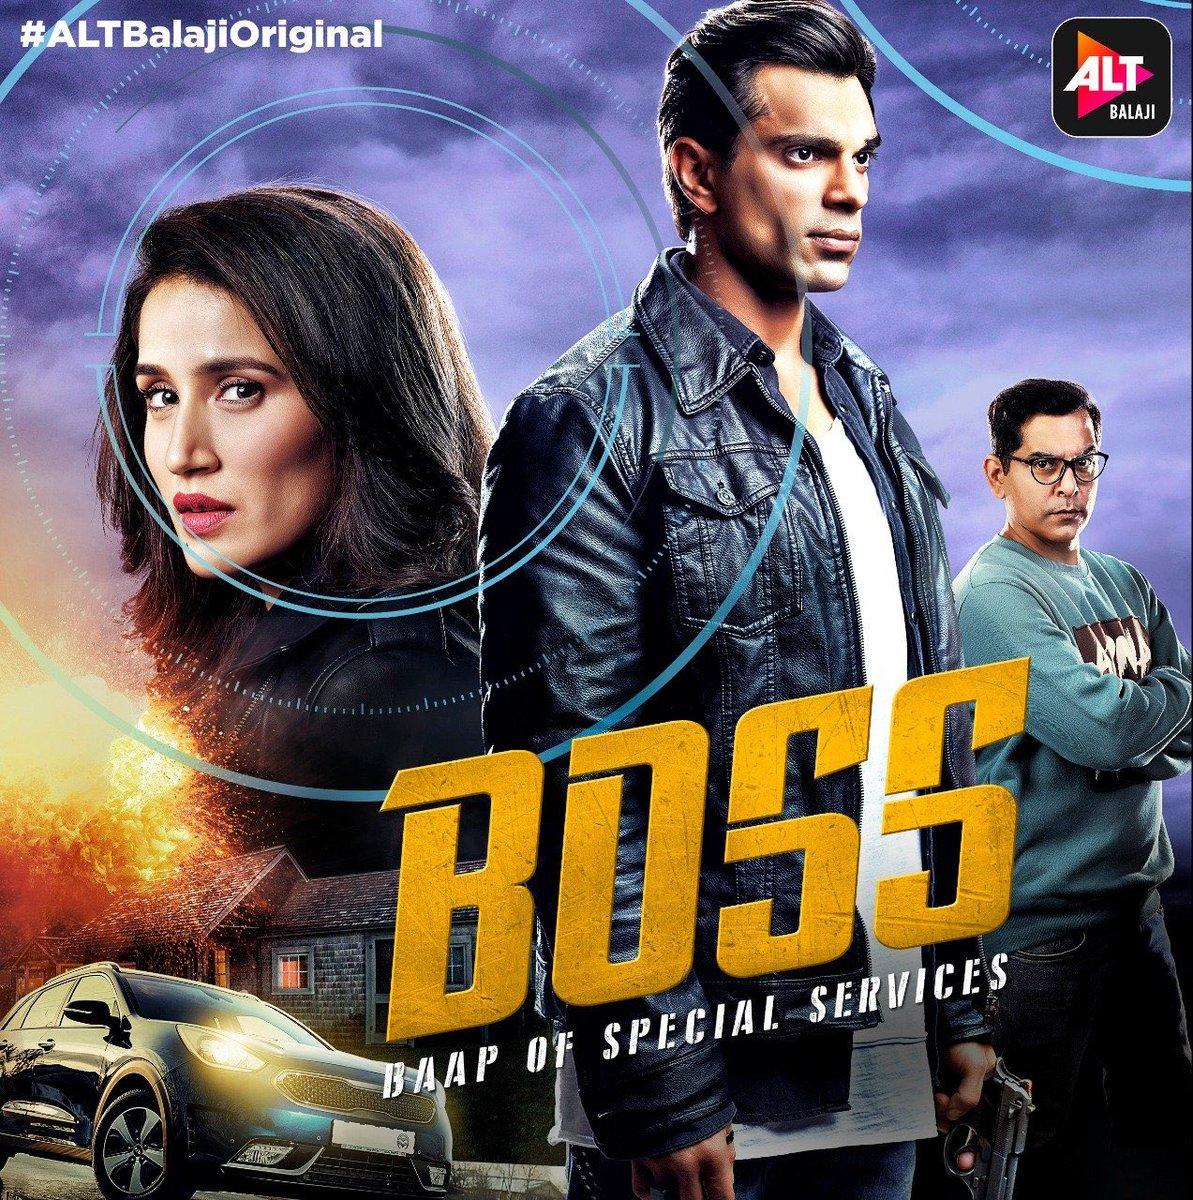 Get ready to meet the ultimate #BOSS -Baap Of Special Services! Trailer streaming 12th July @Iamksgofficial #SagarikaGhatge @gauravgera #VeerAryan #AnveshiJain   @A_nisa_i_am  @ektaravikapoor @altbalaji #AnkushBhatt #AshishKapoor Casting: @iamkunalmshah (#KunalMShahCastingAgency)